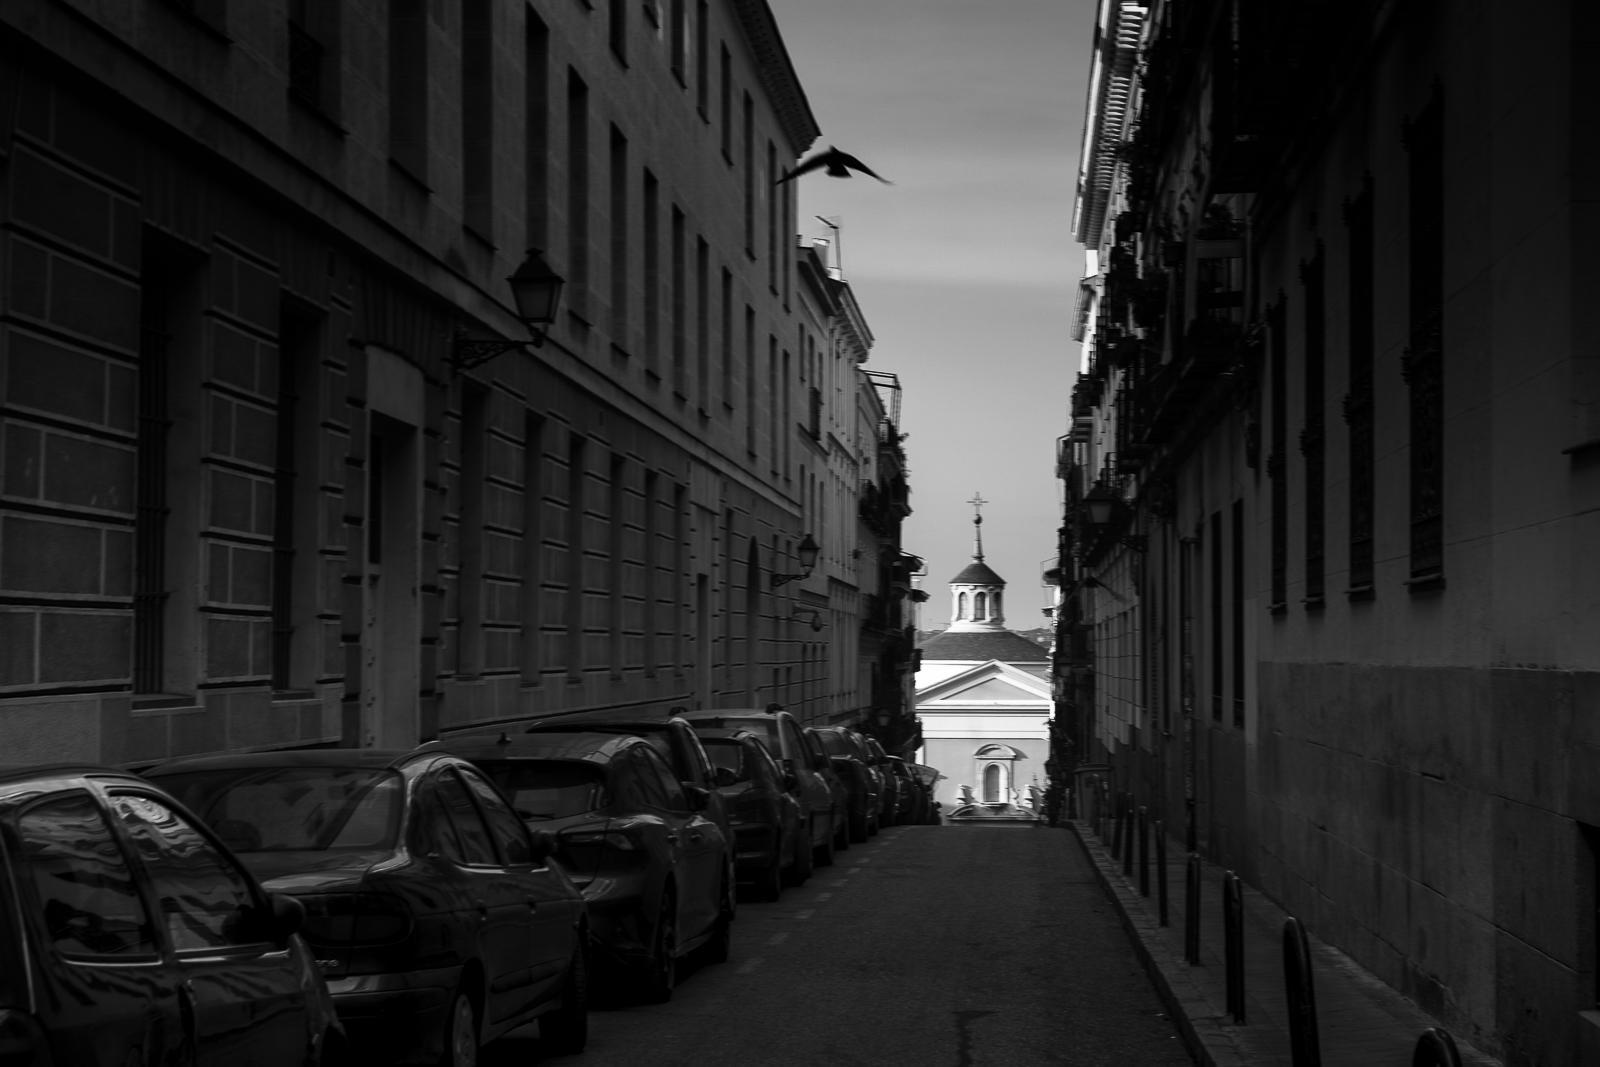 Empty street of Madrid city center during the coronavirus lockdown.